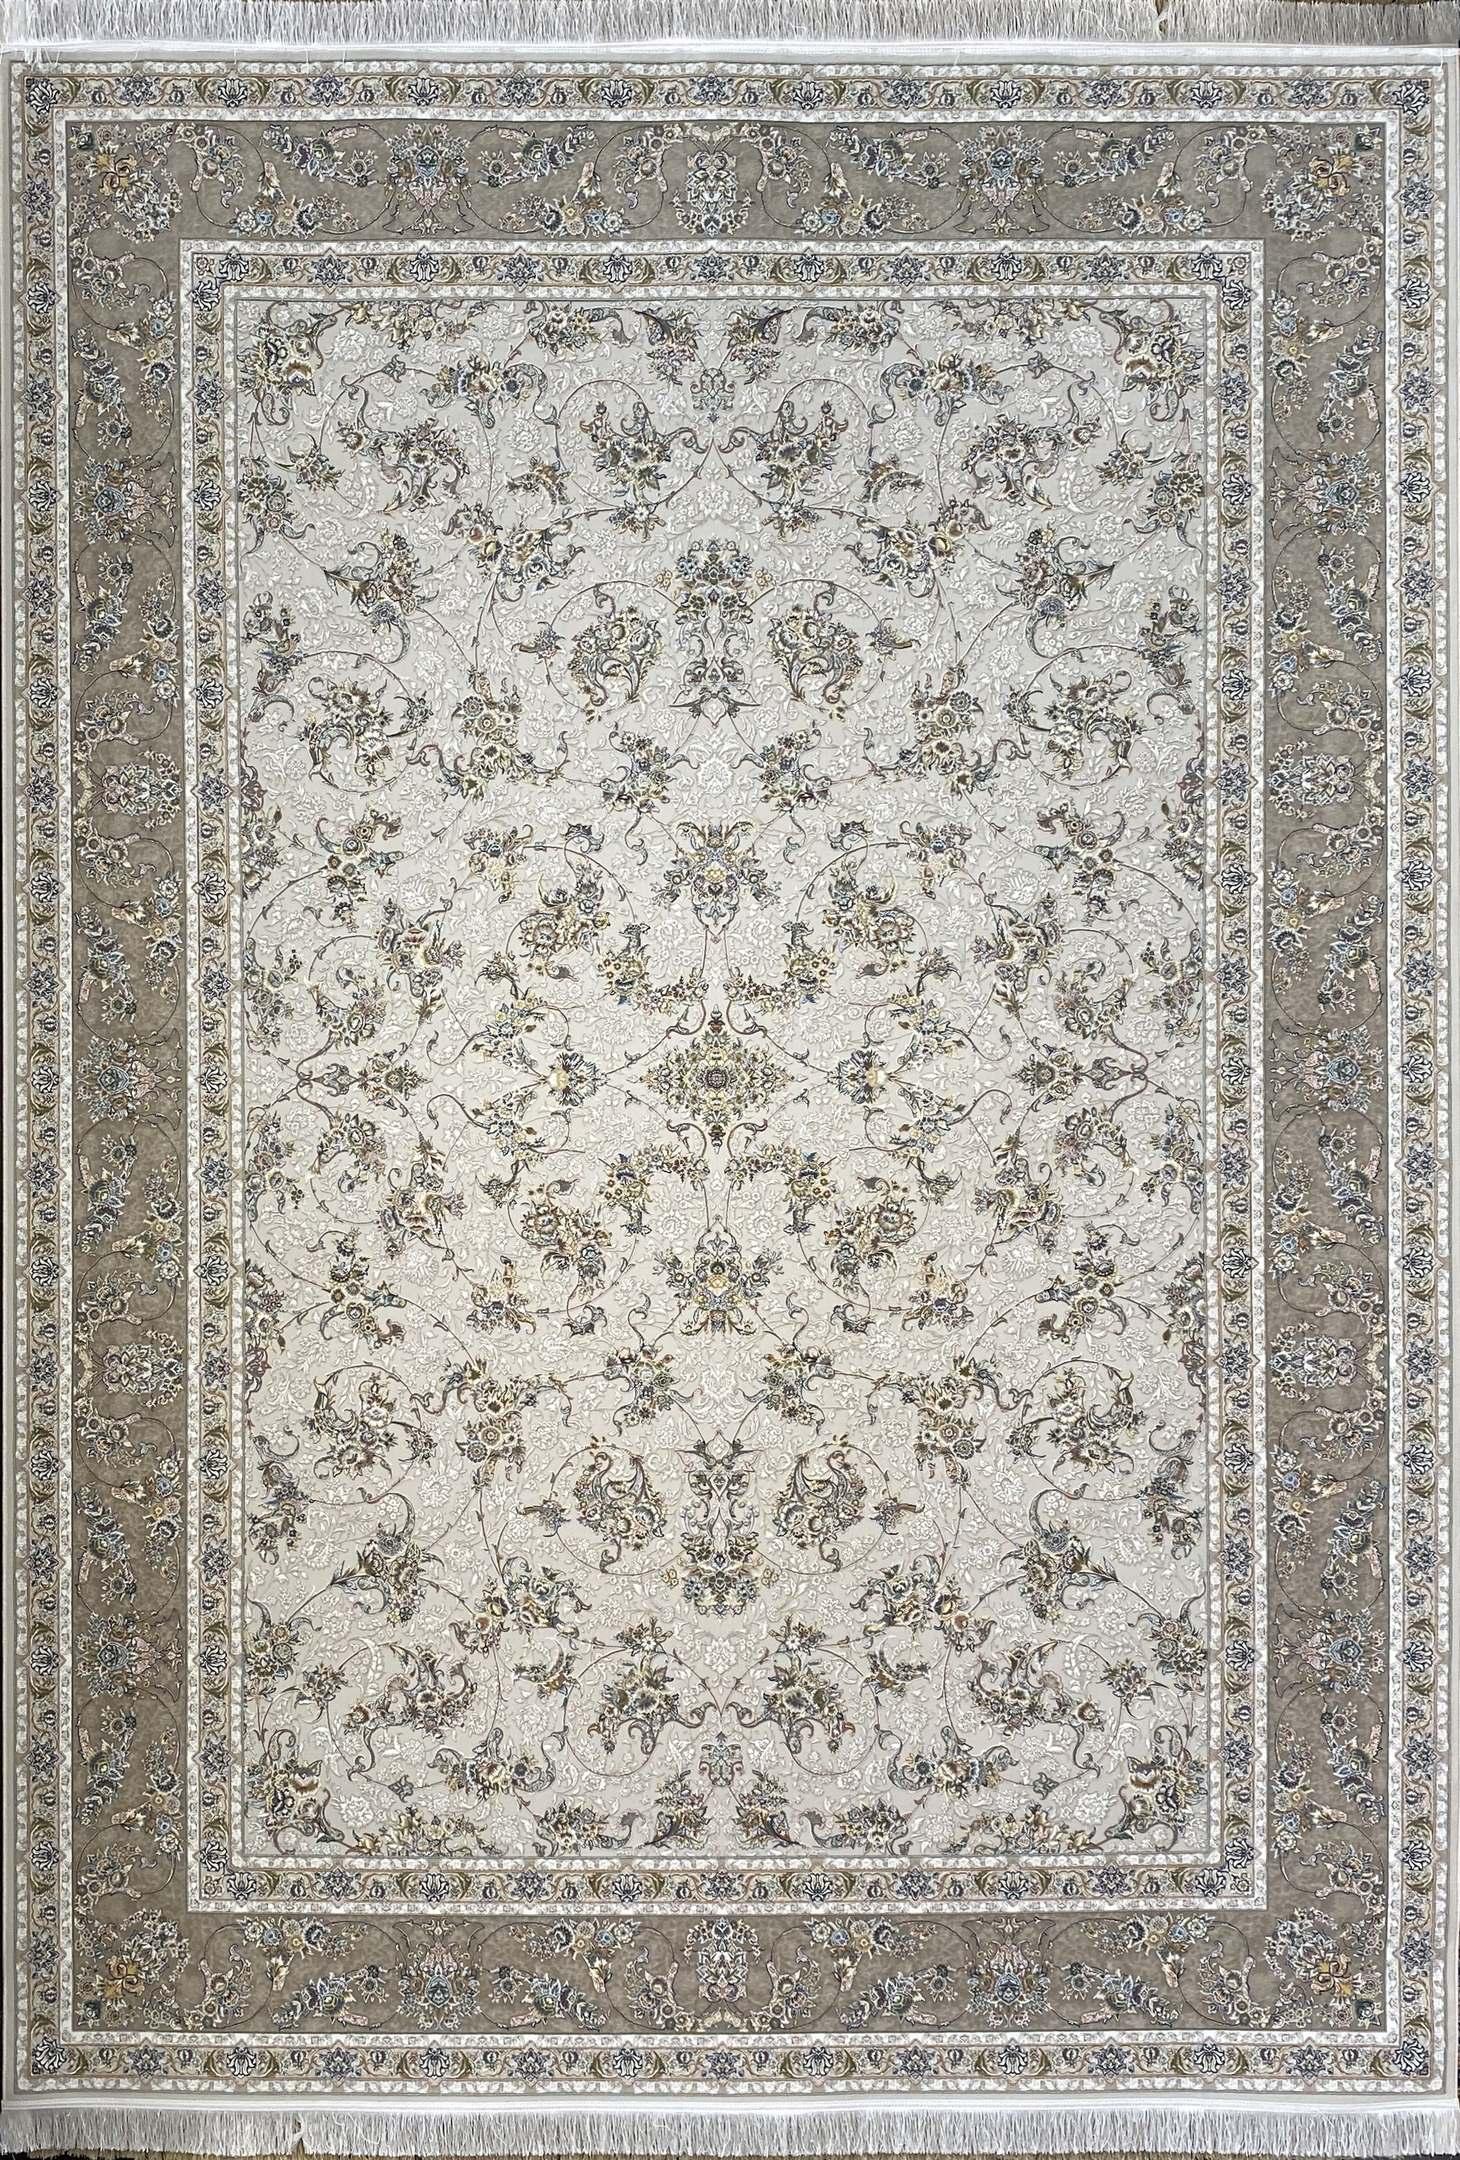 فرش کاشان- نقشه مهرسا کرم گلبرجسته